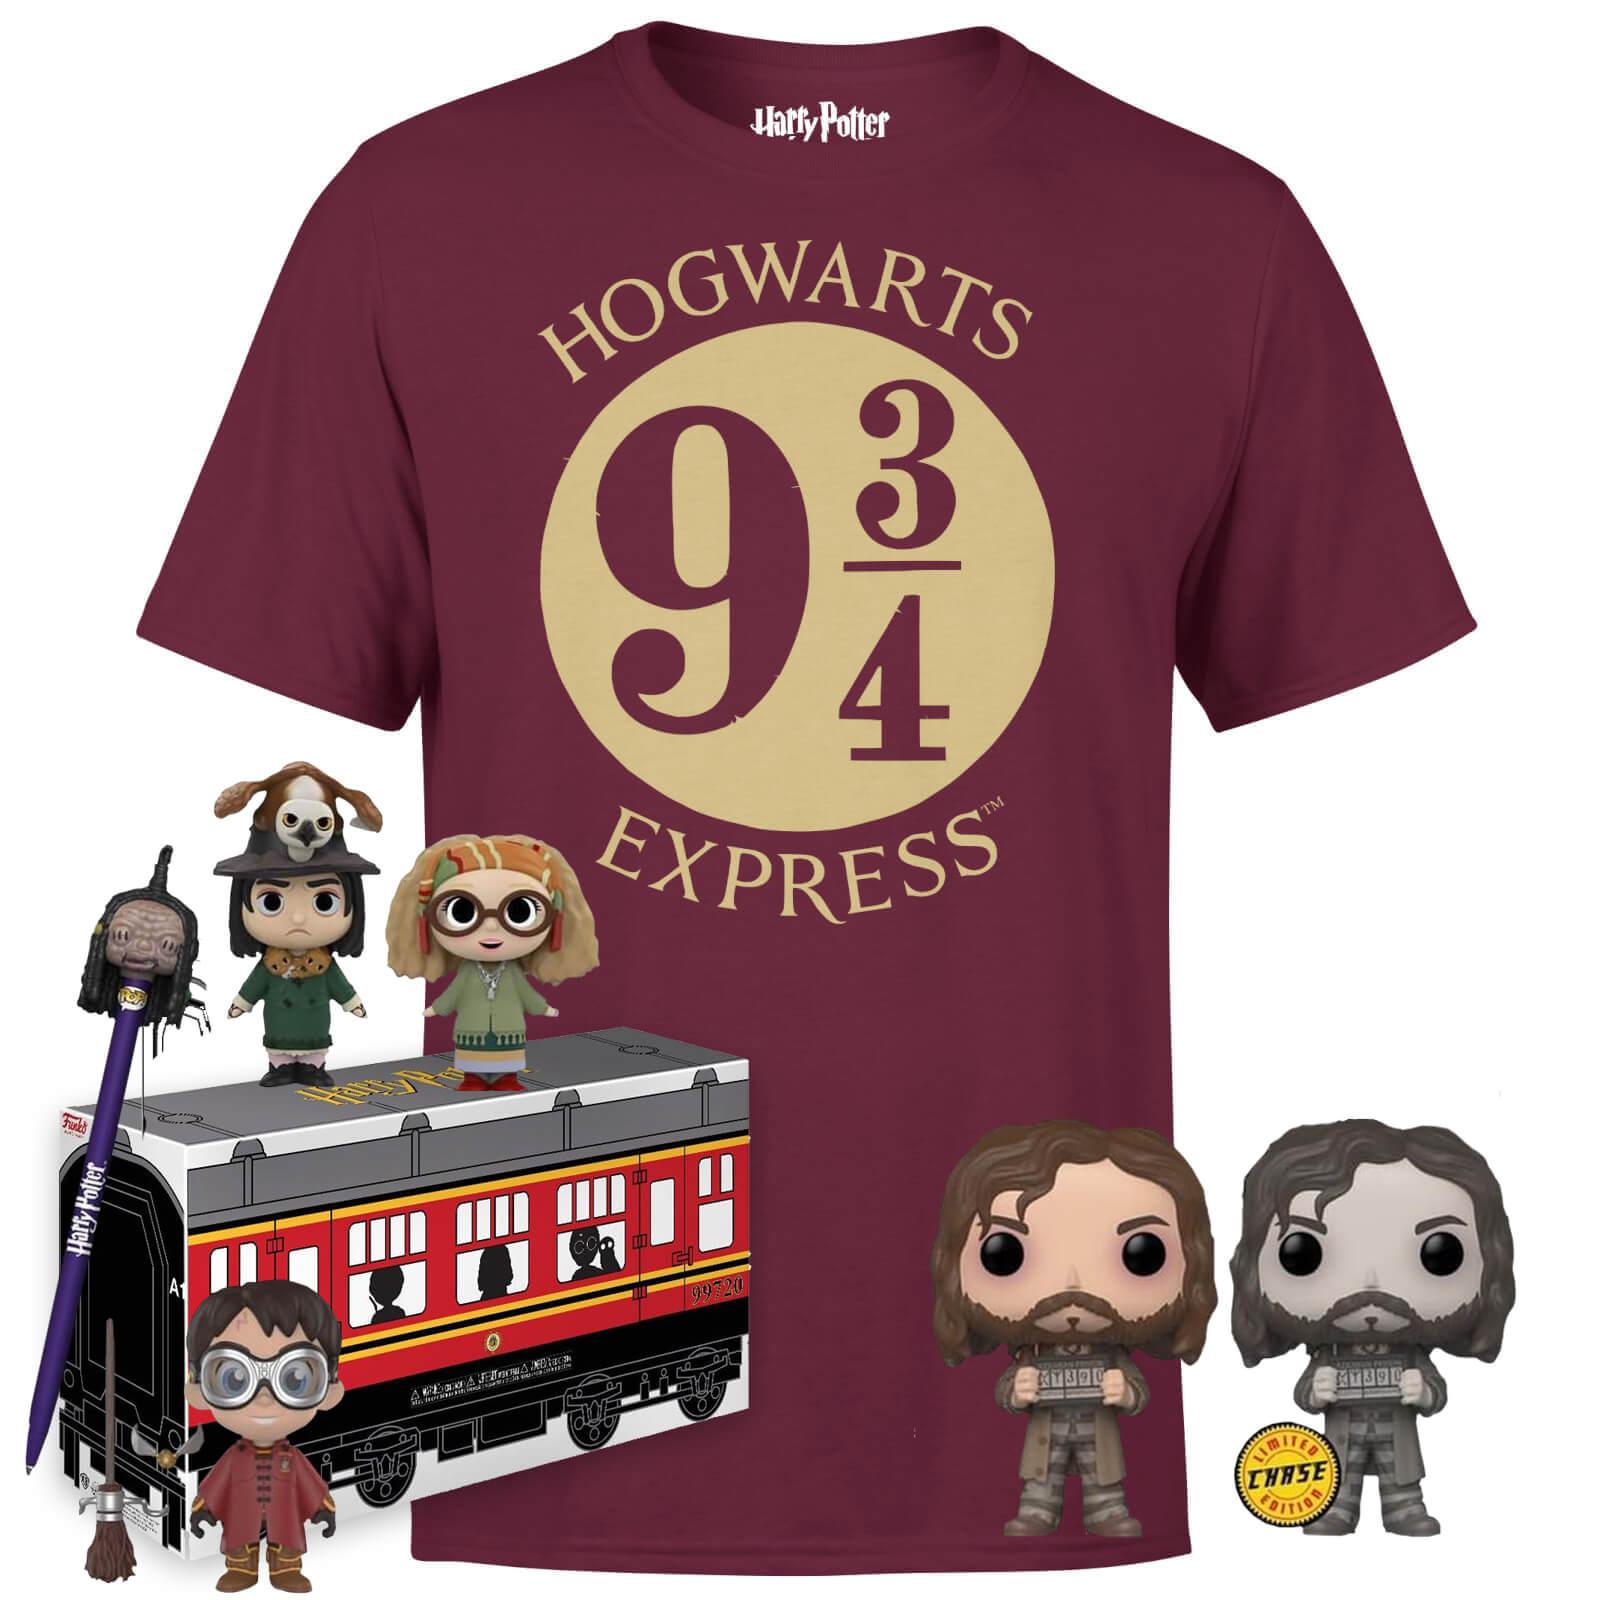 Lot Harry Potter : 1 T-shirt + 1 figurine HP Quidditch + 1 Funko Pop! Sirius Black + 1 Funko Mini + 1 boîte Poudlard Express + 1 crayon